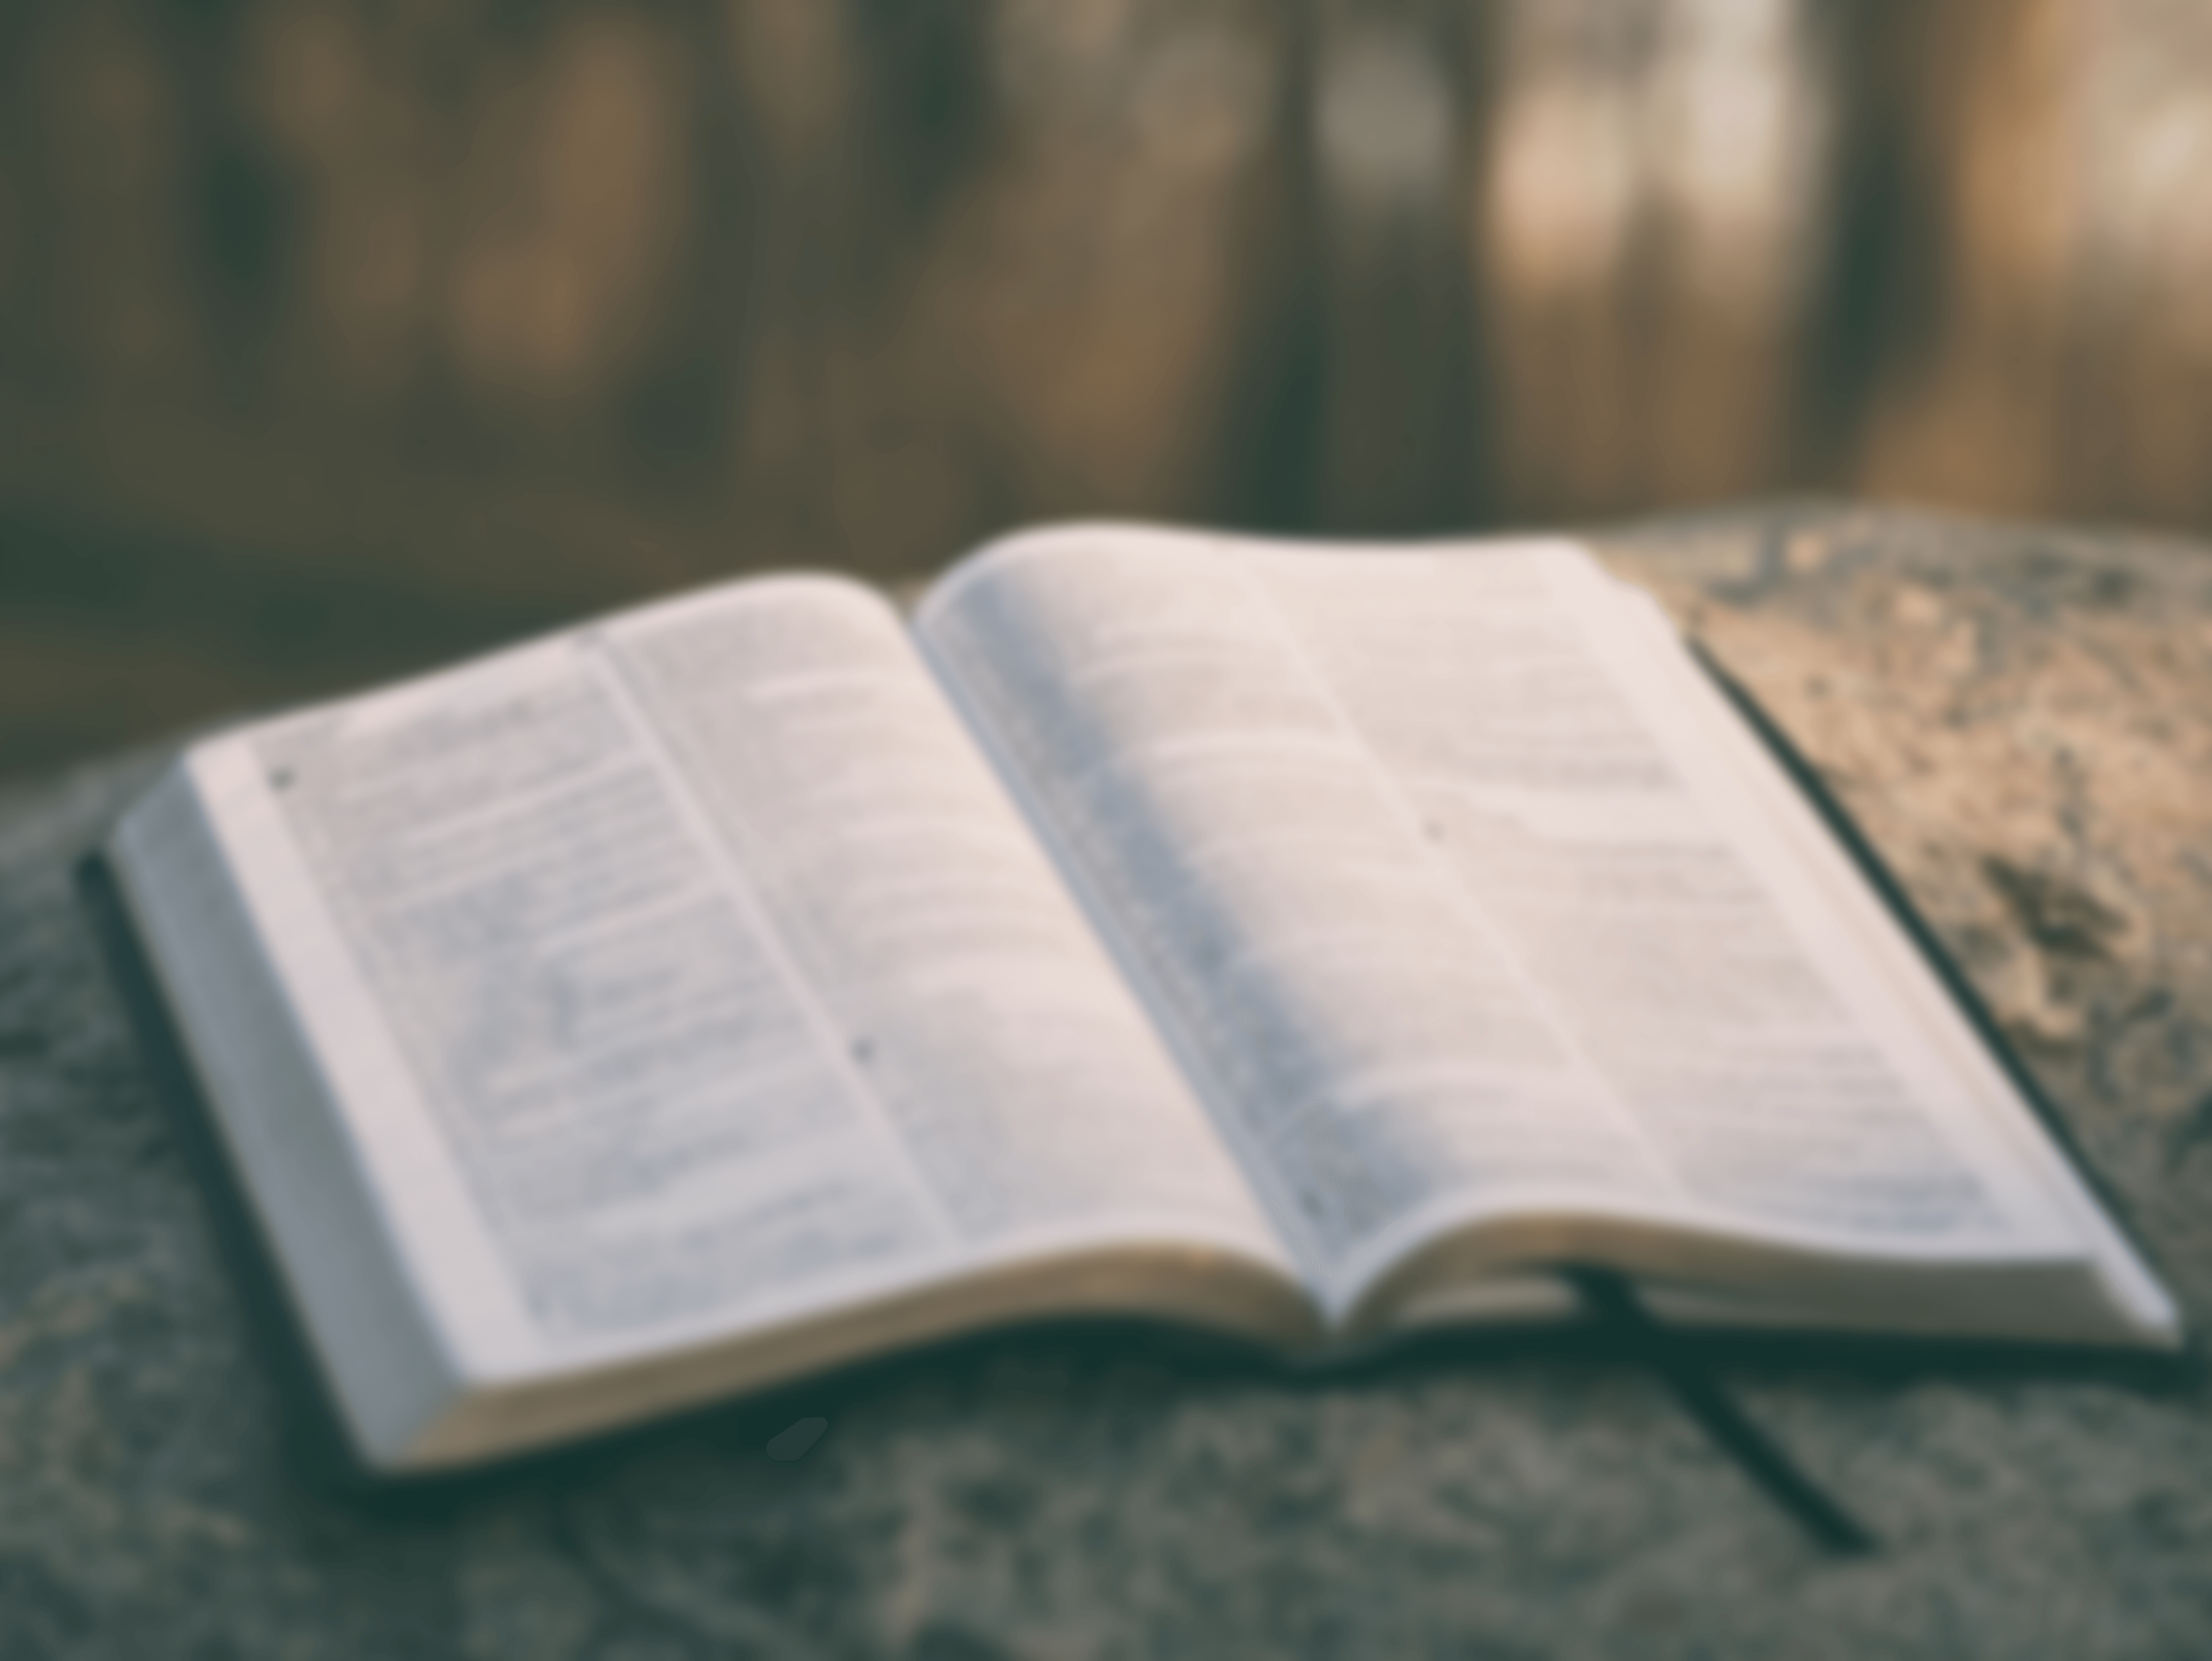 Prime Timers Bible Study - POSTPONED